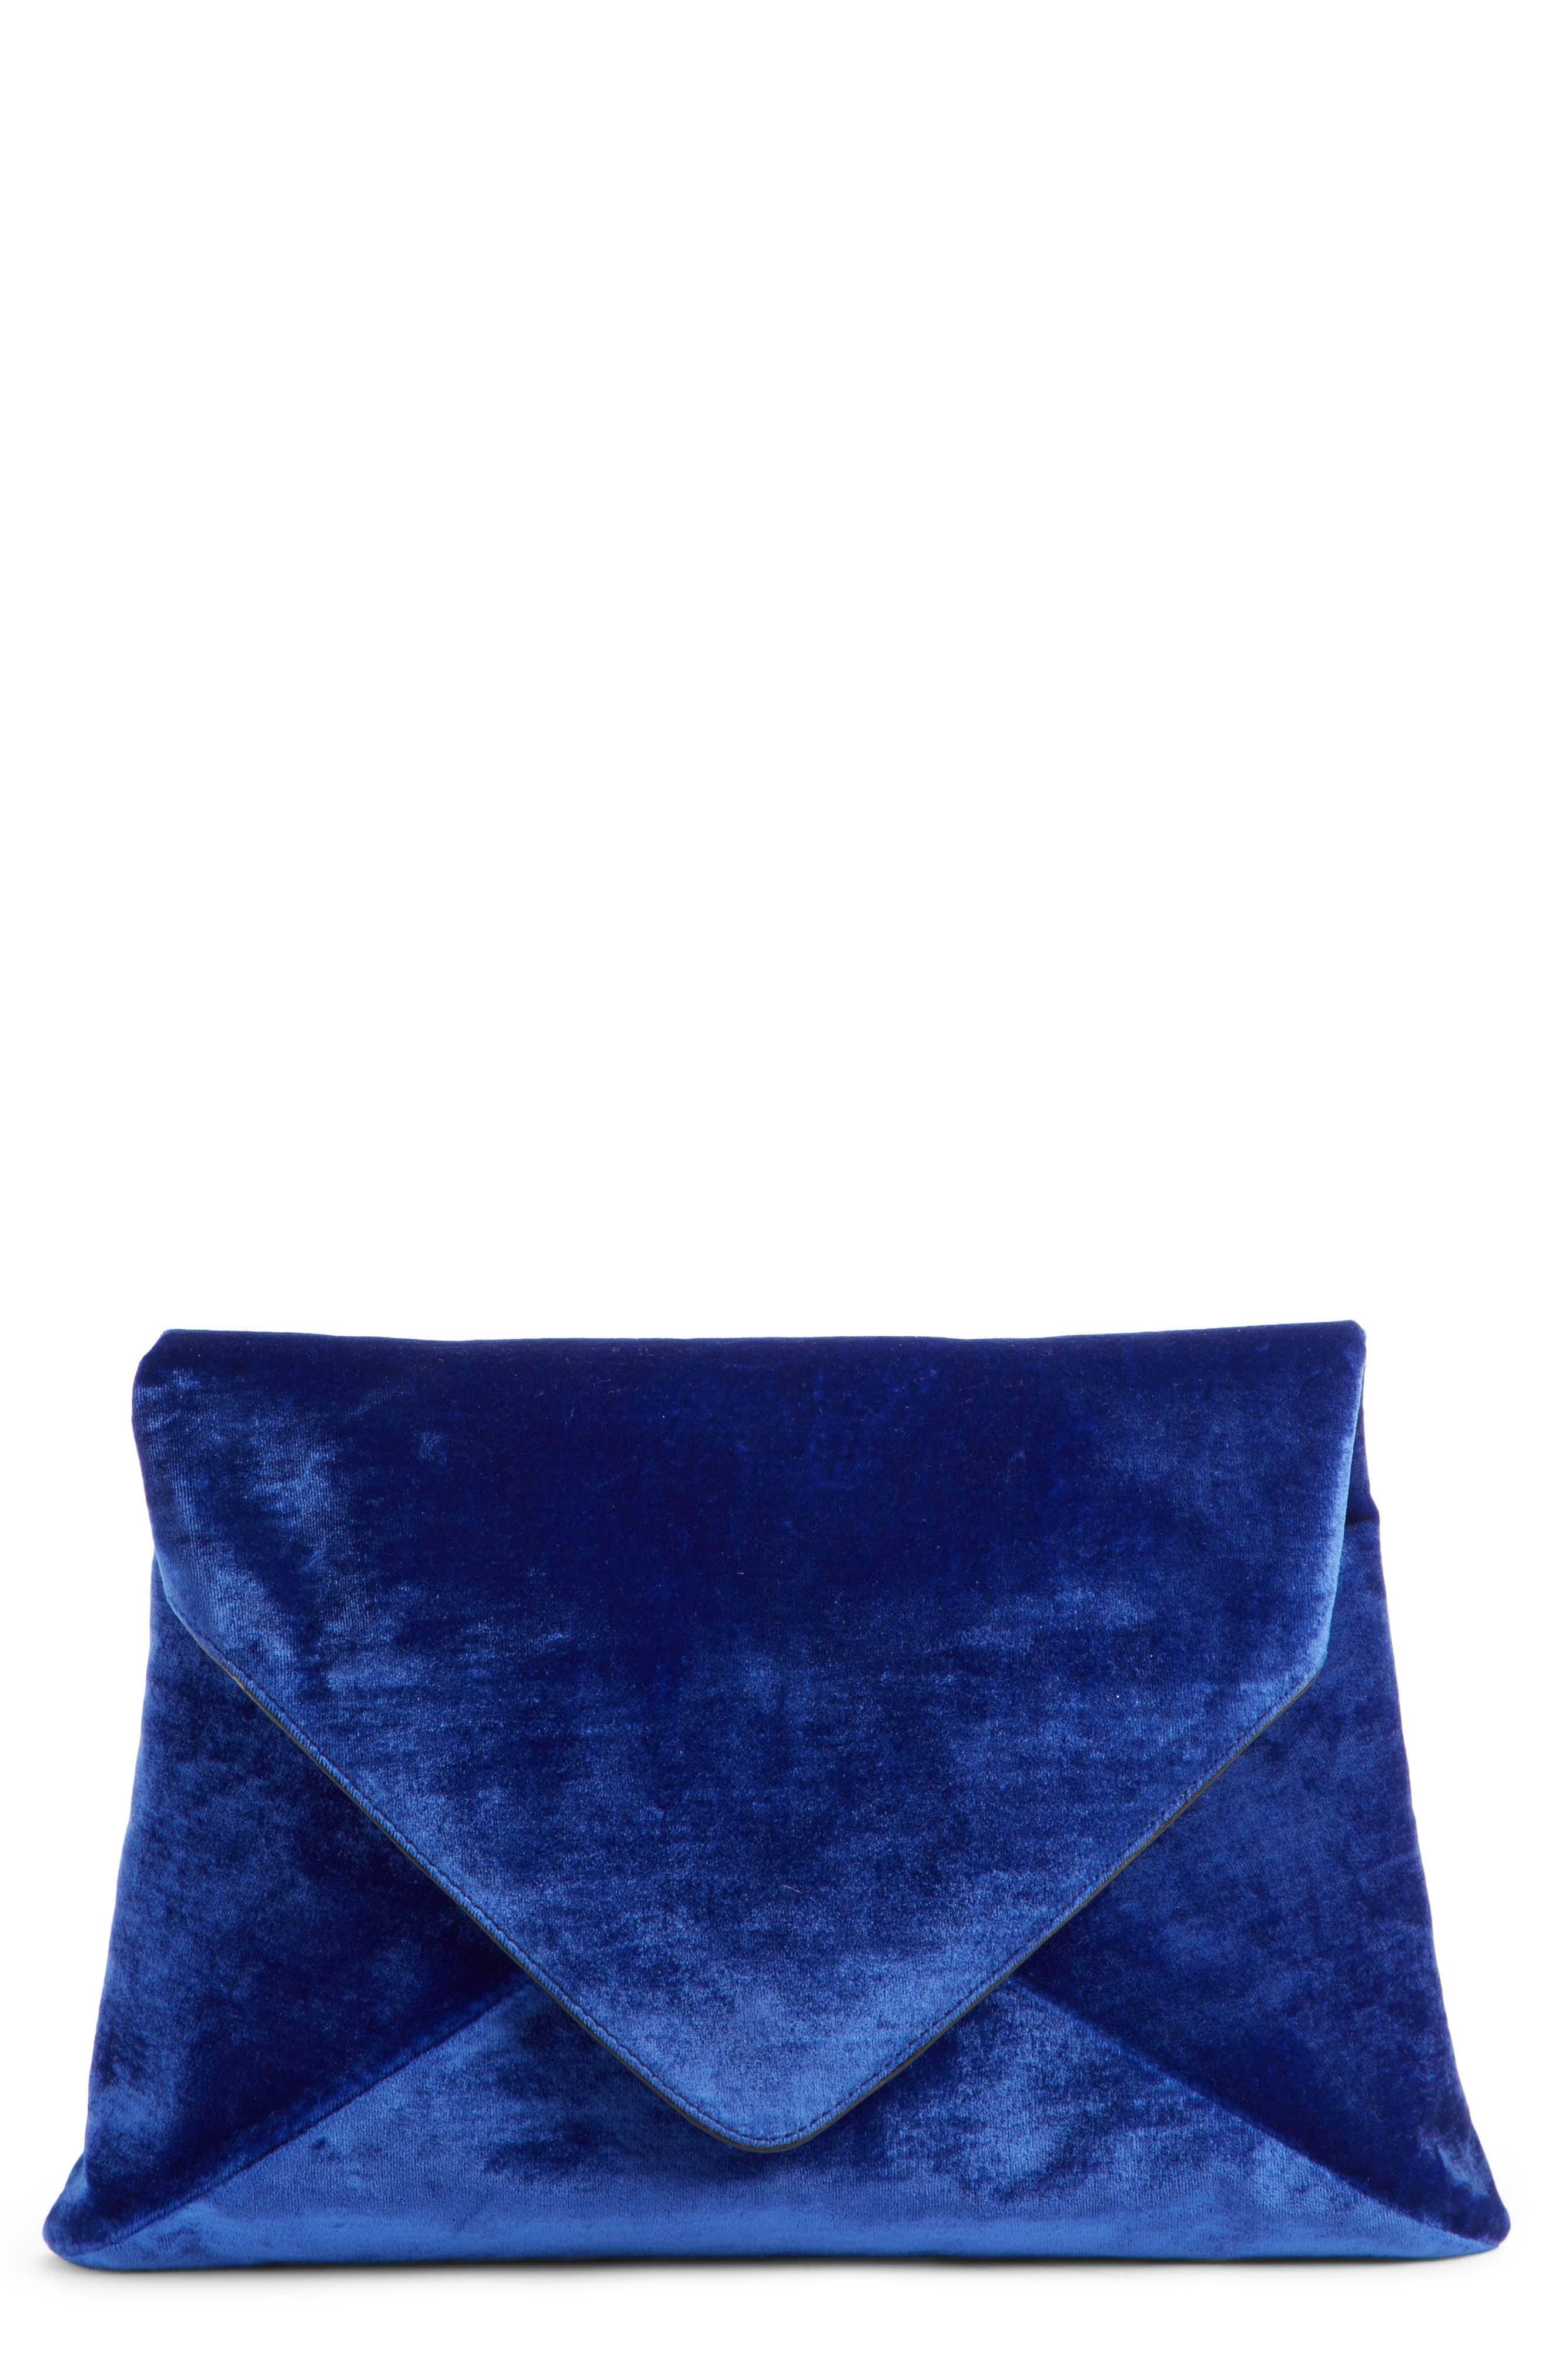 Velvet Envelope Clutch,                         Main,                         color, 400